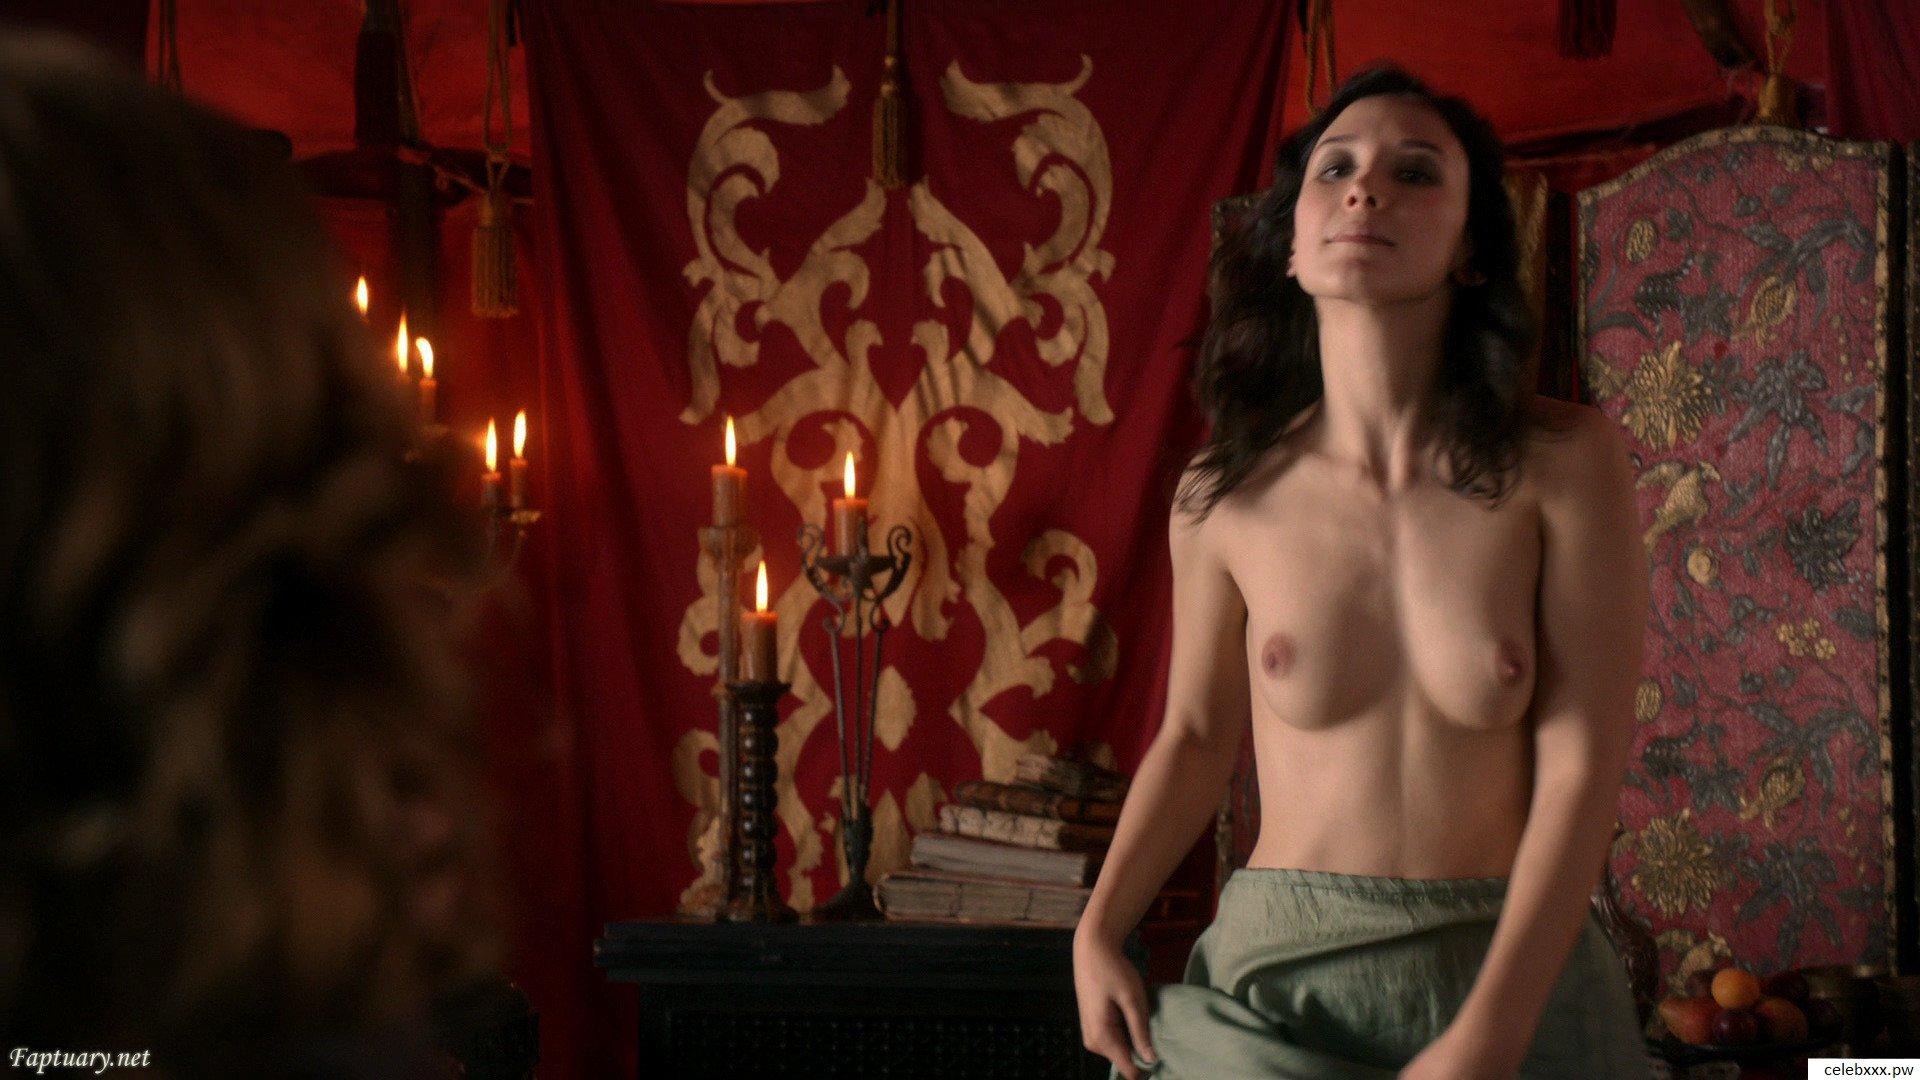 Shailene Woodley sexiest pic